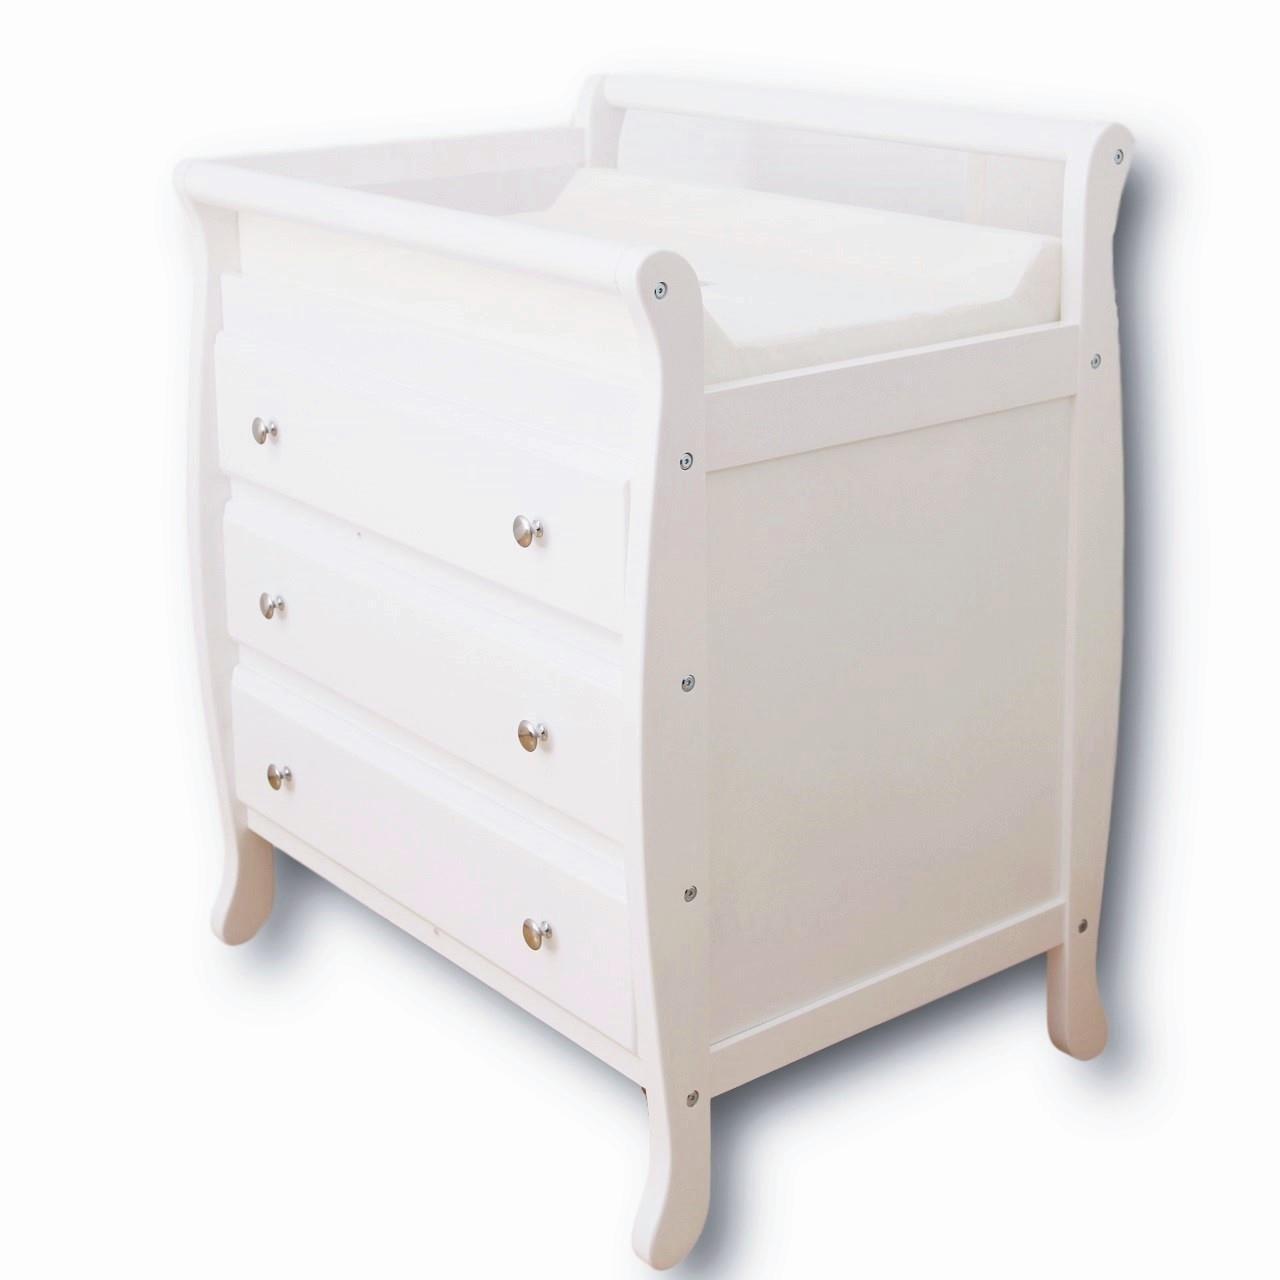 3 DRAWER WHITE Baby Change Table Chest Dresser Cabinet Changer Nursery